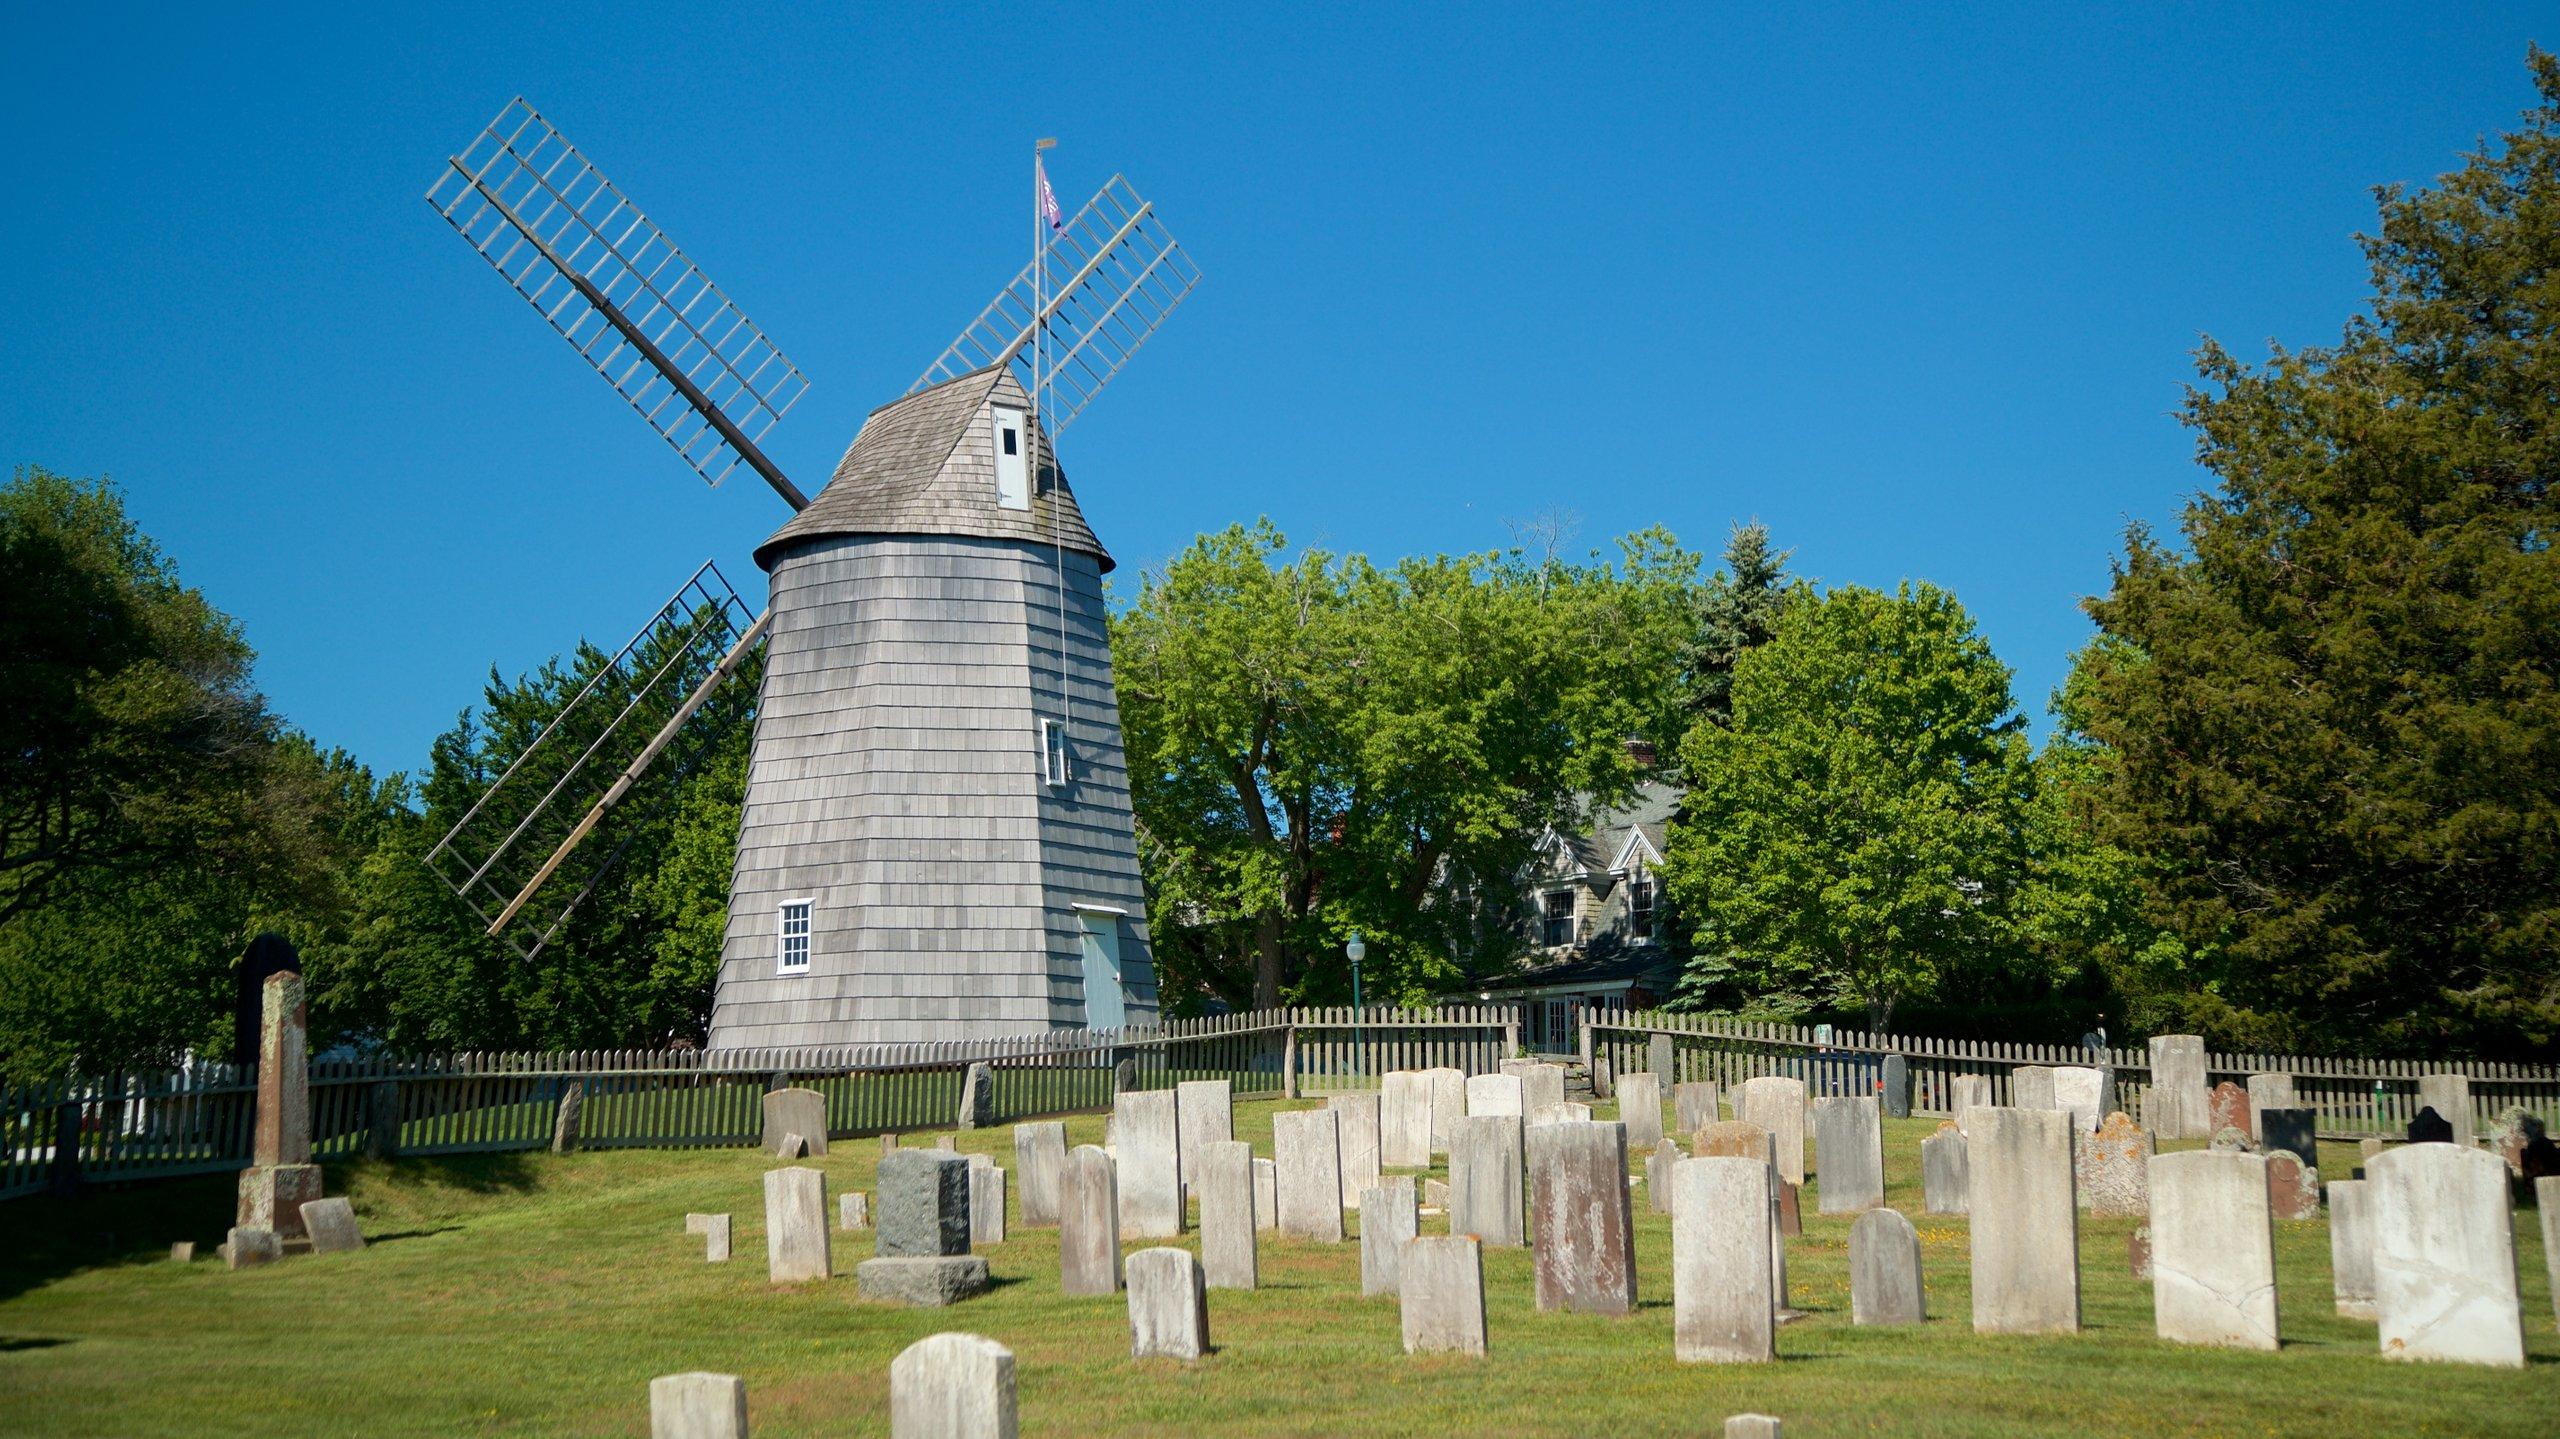 East Hampton, New York, United States of America